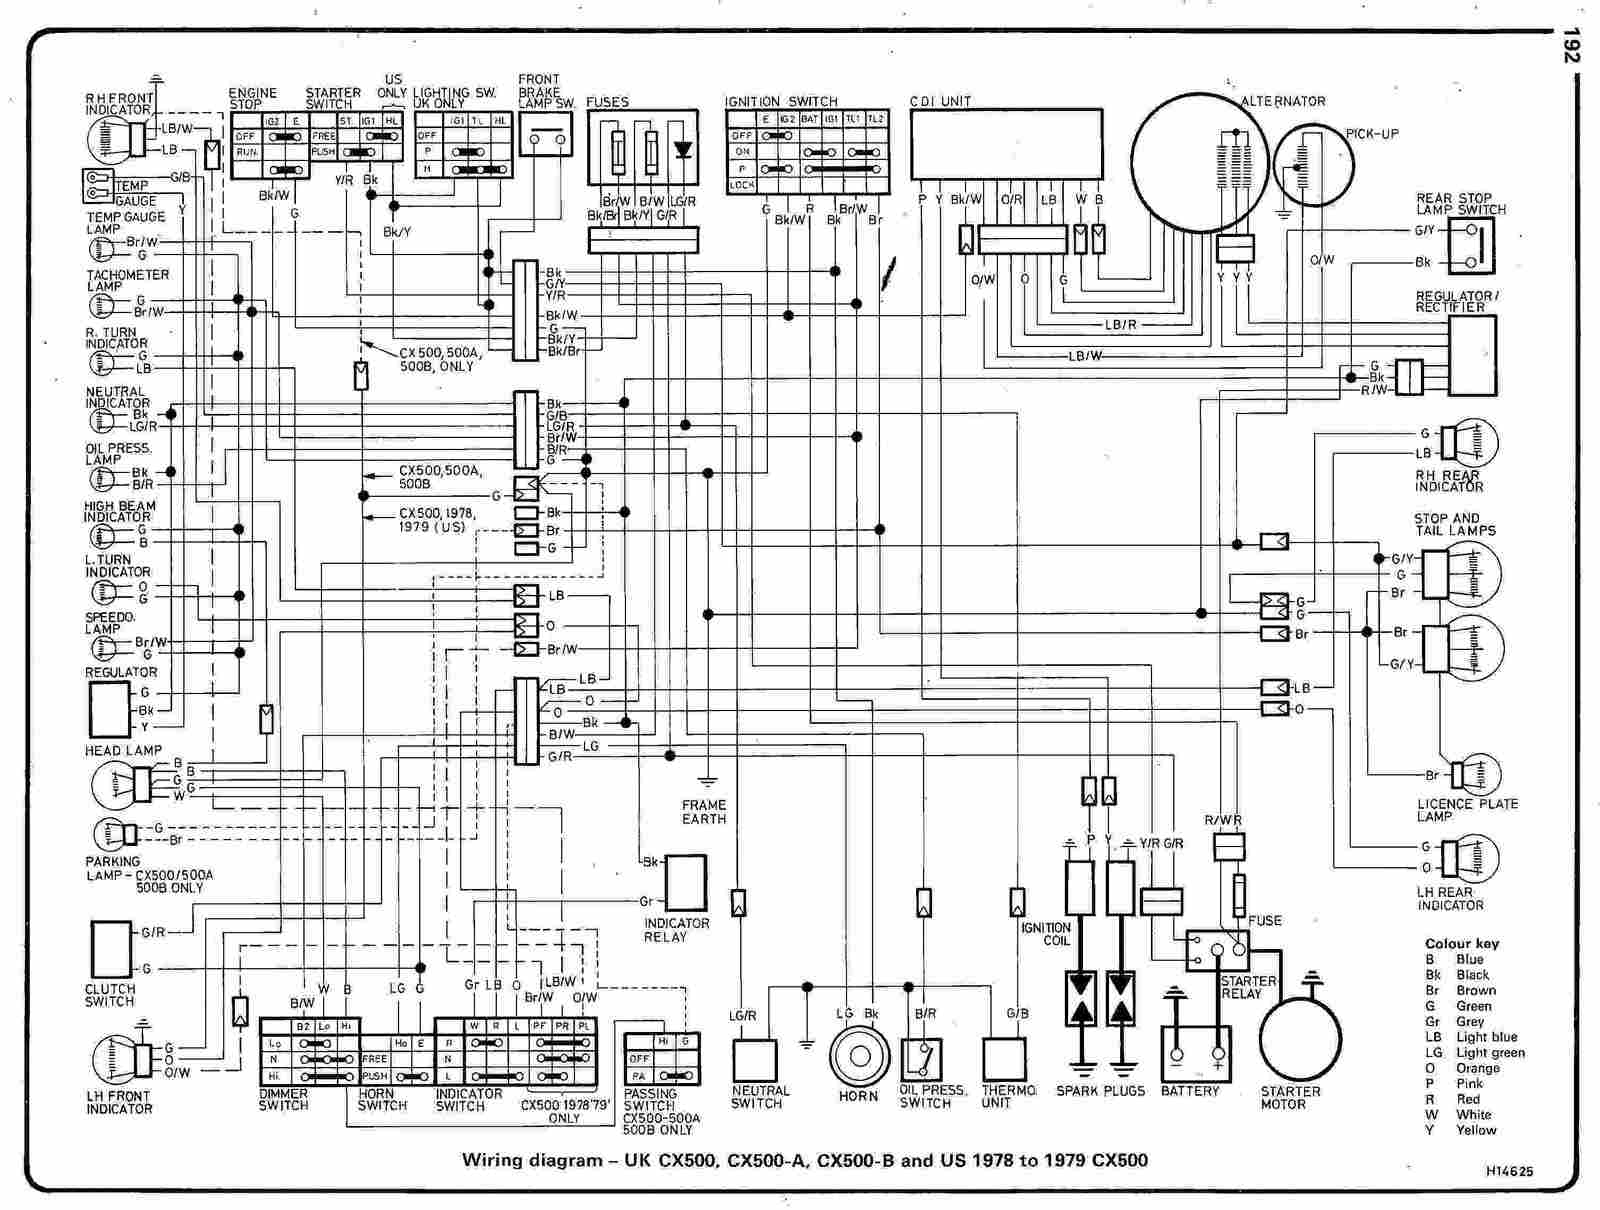 jeep cj7 wiring harness diagram omron relay my4n 1978 cj5 free engine